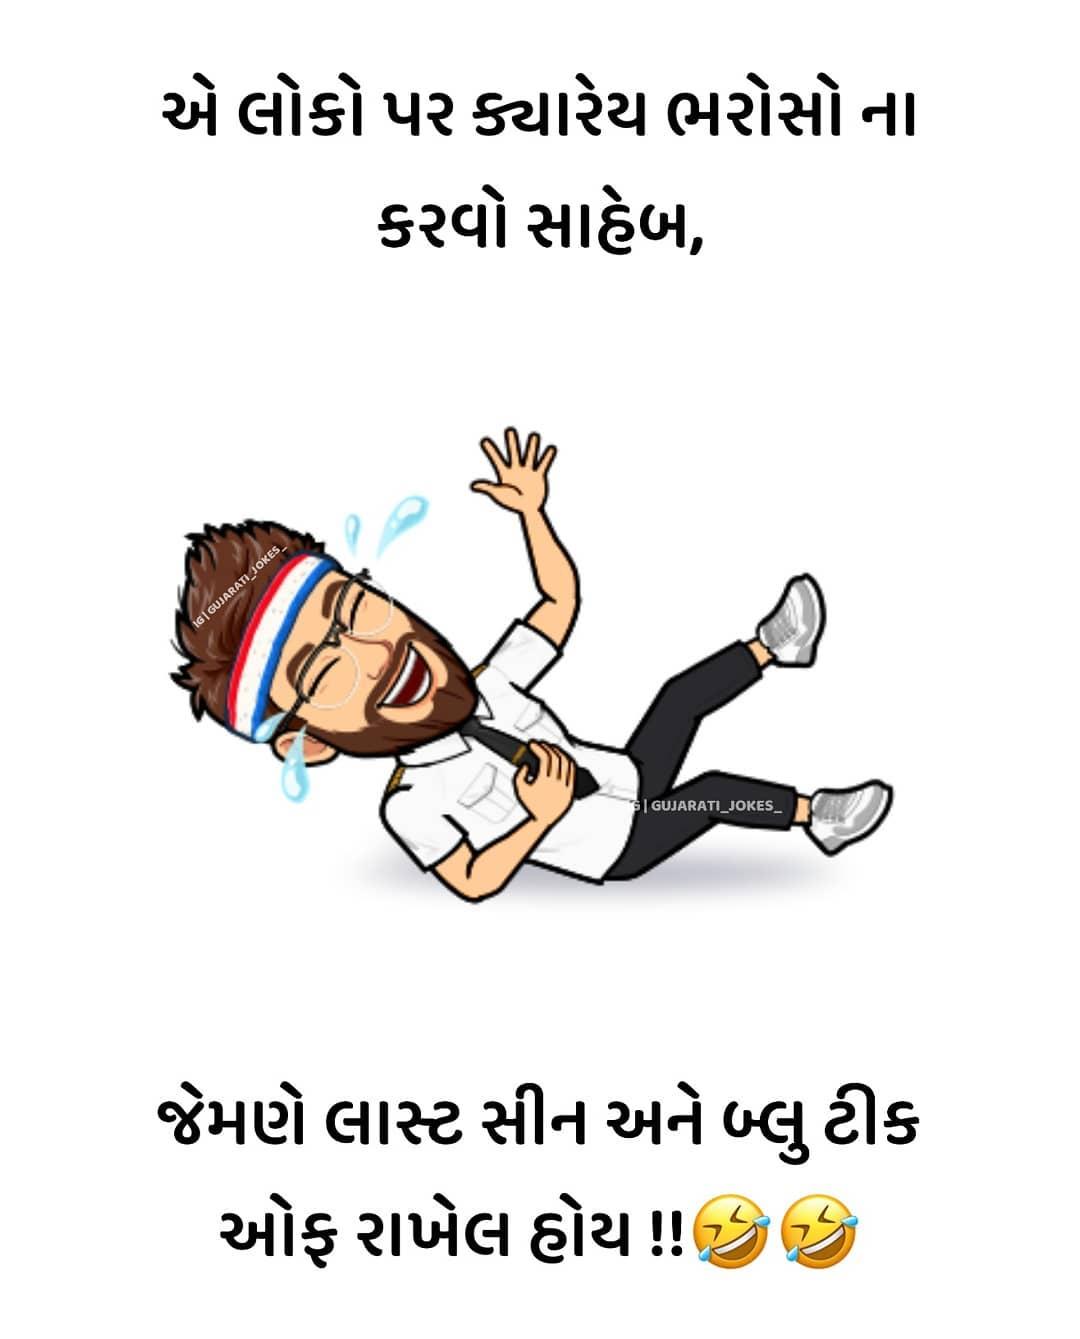 jokes for gujarati